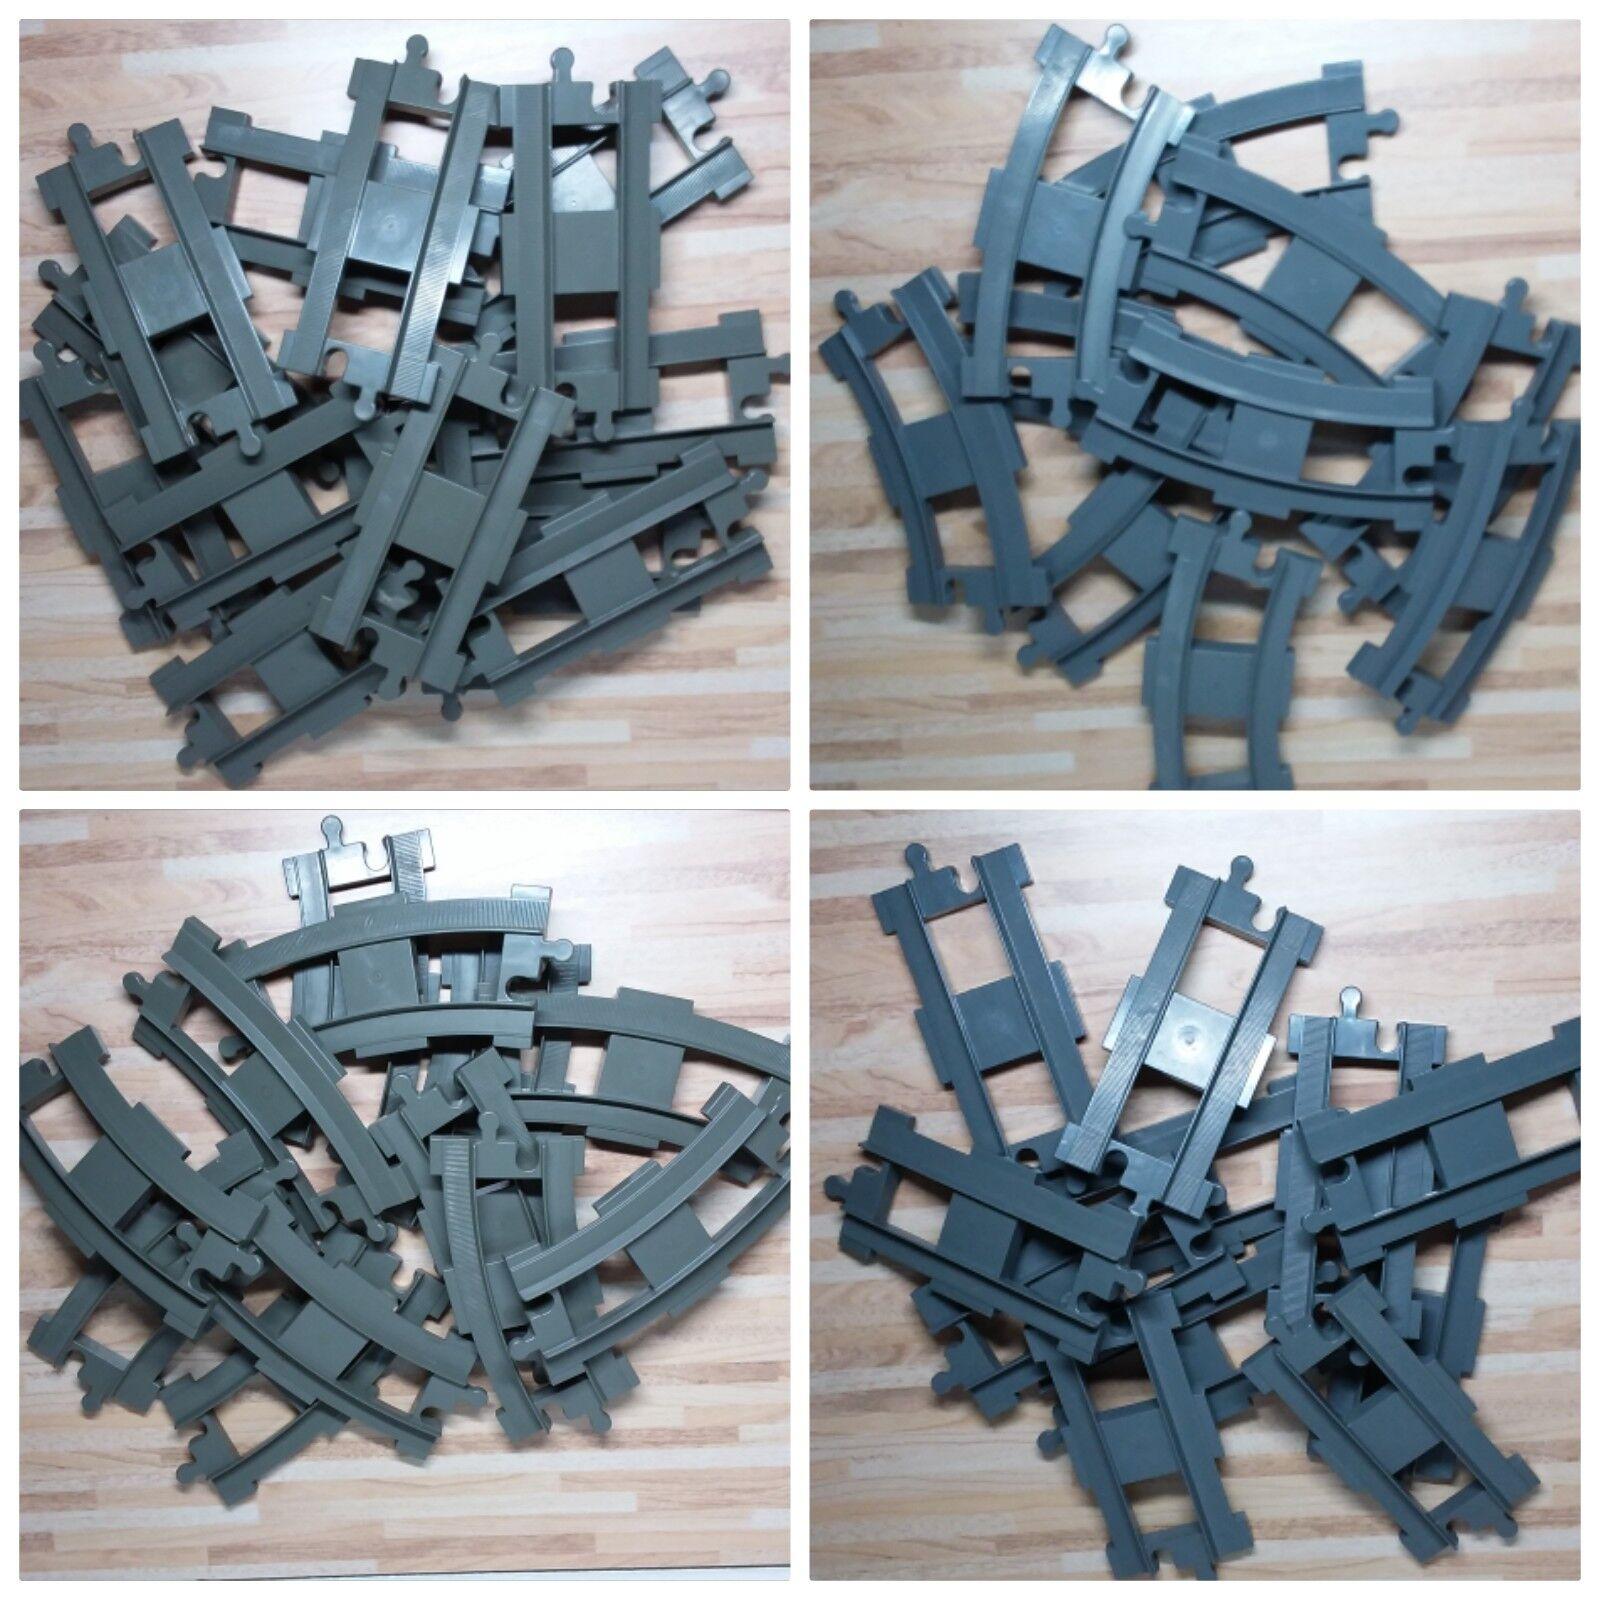 *Sonderangebot*Lego Duplo Eisenbahnschienen Set Kurven+Grade hellgrau/dunkelgrau